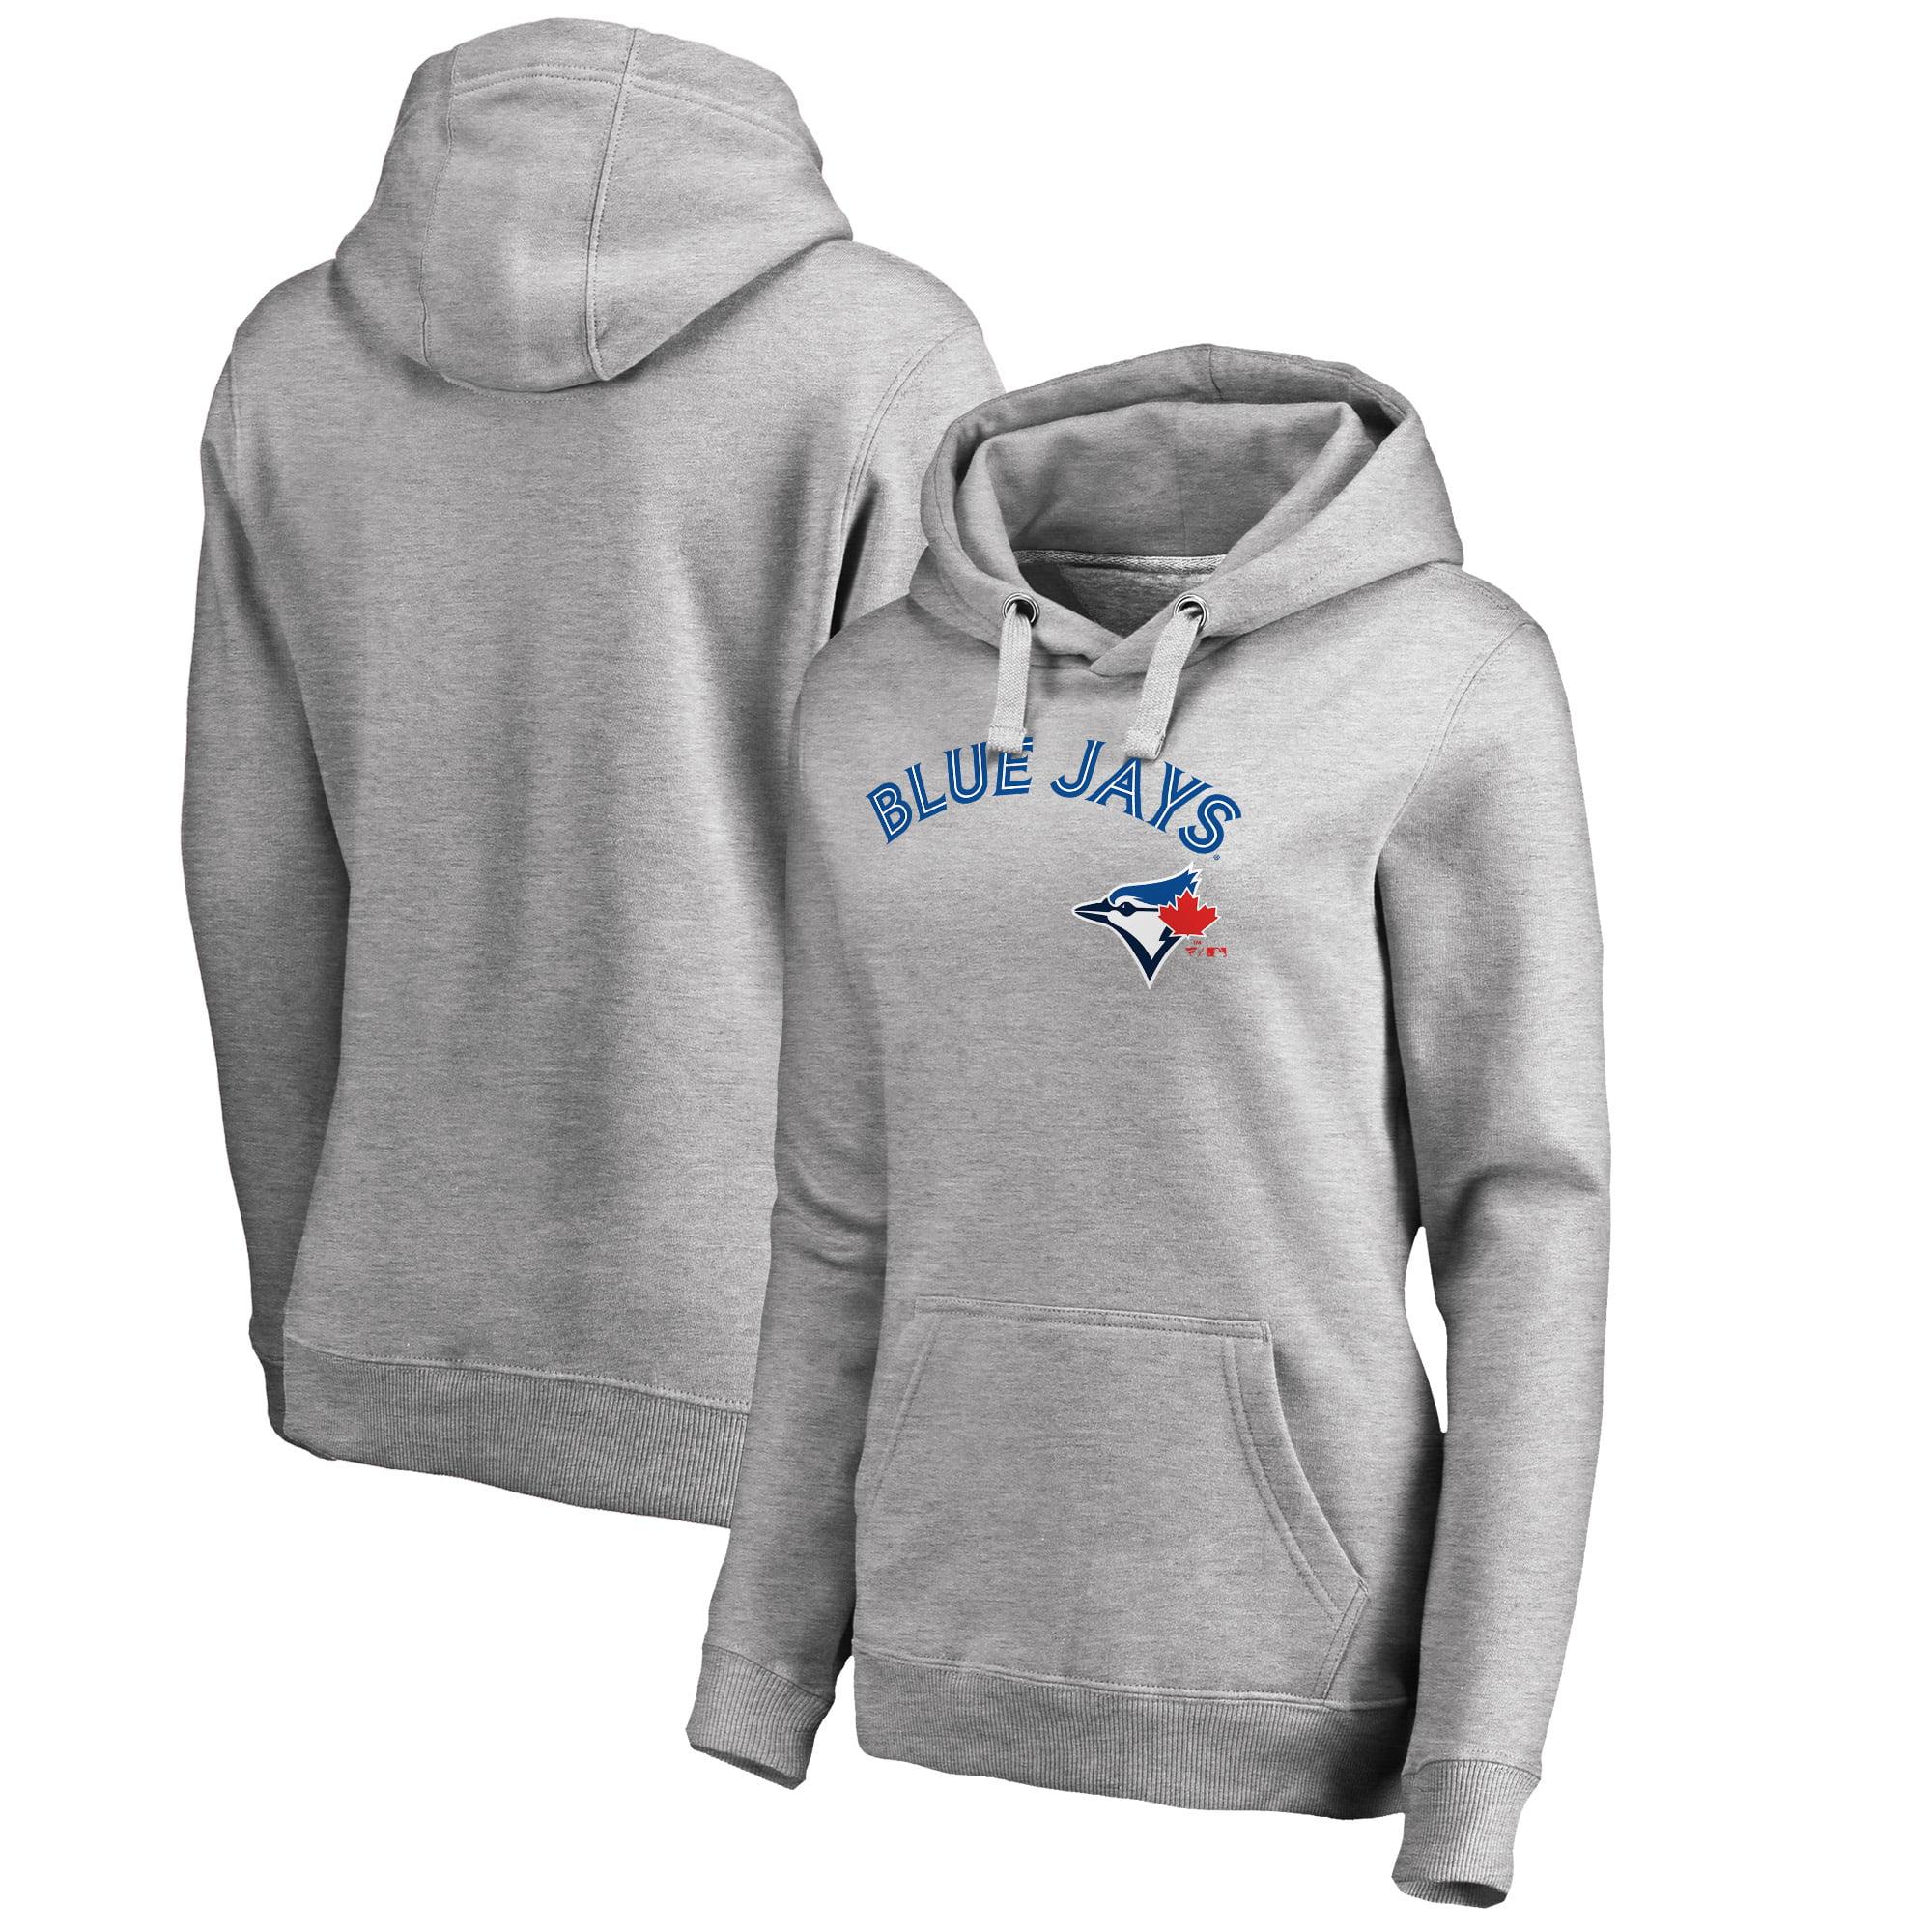 Toronto Blue Jays Fanatics Branded Women's Plus Size Team Lockup Pullover Hoodie - Heathered Gray